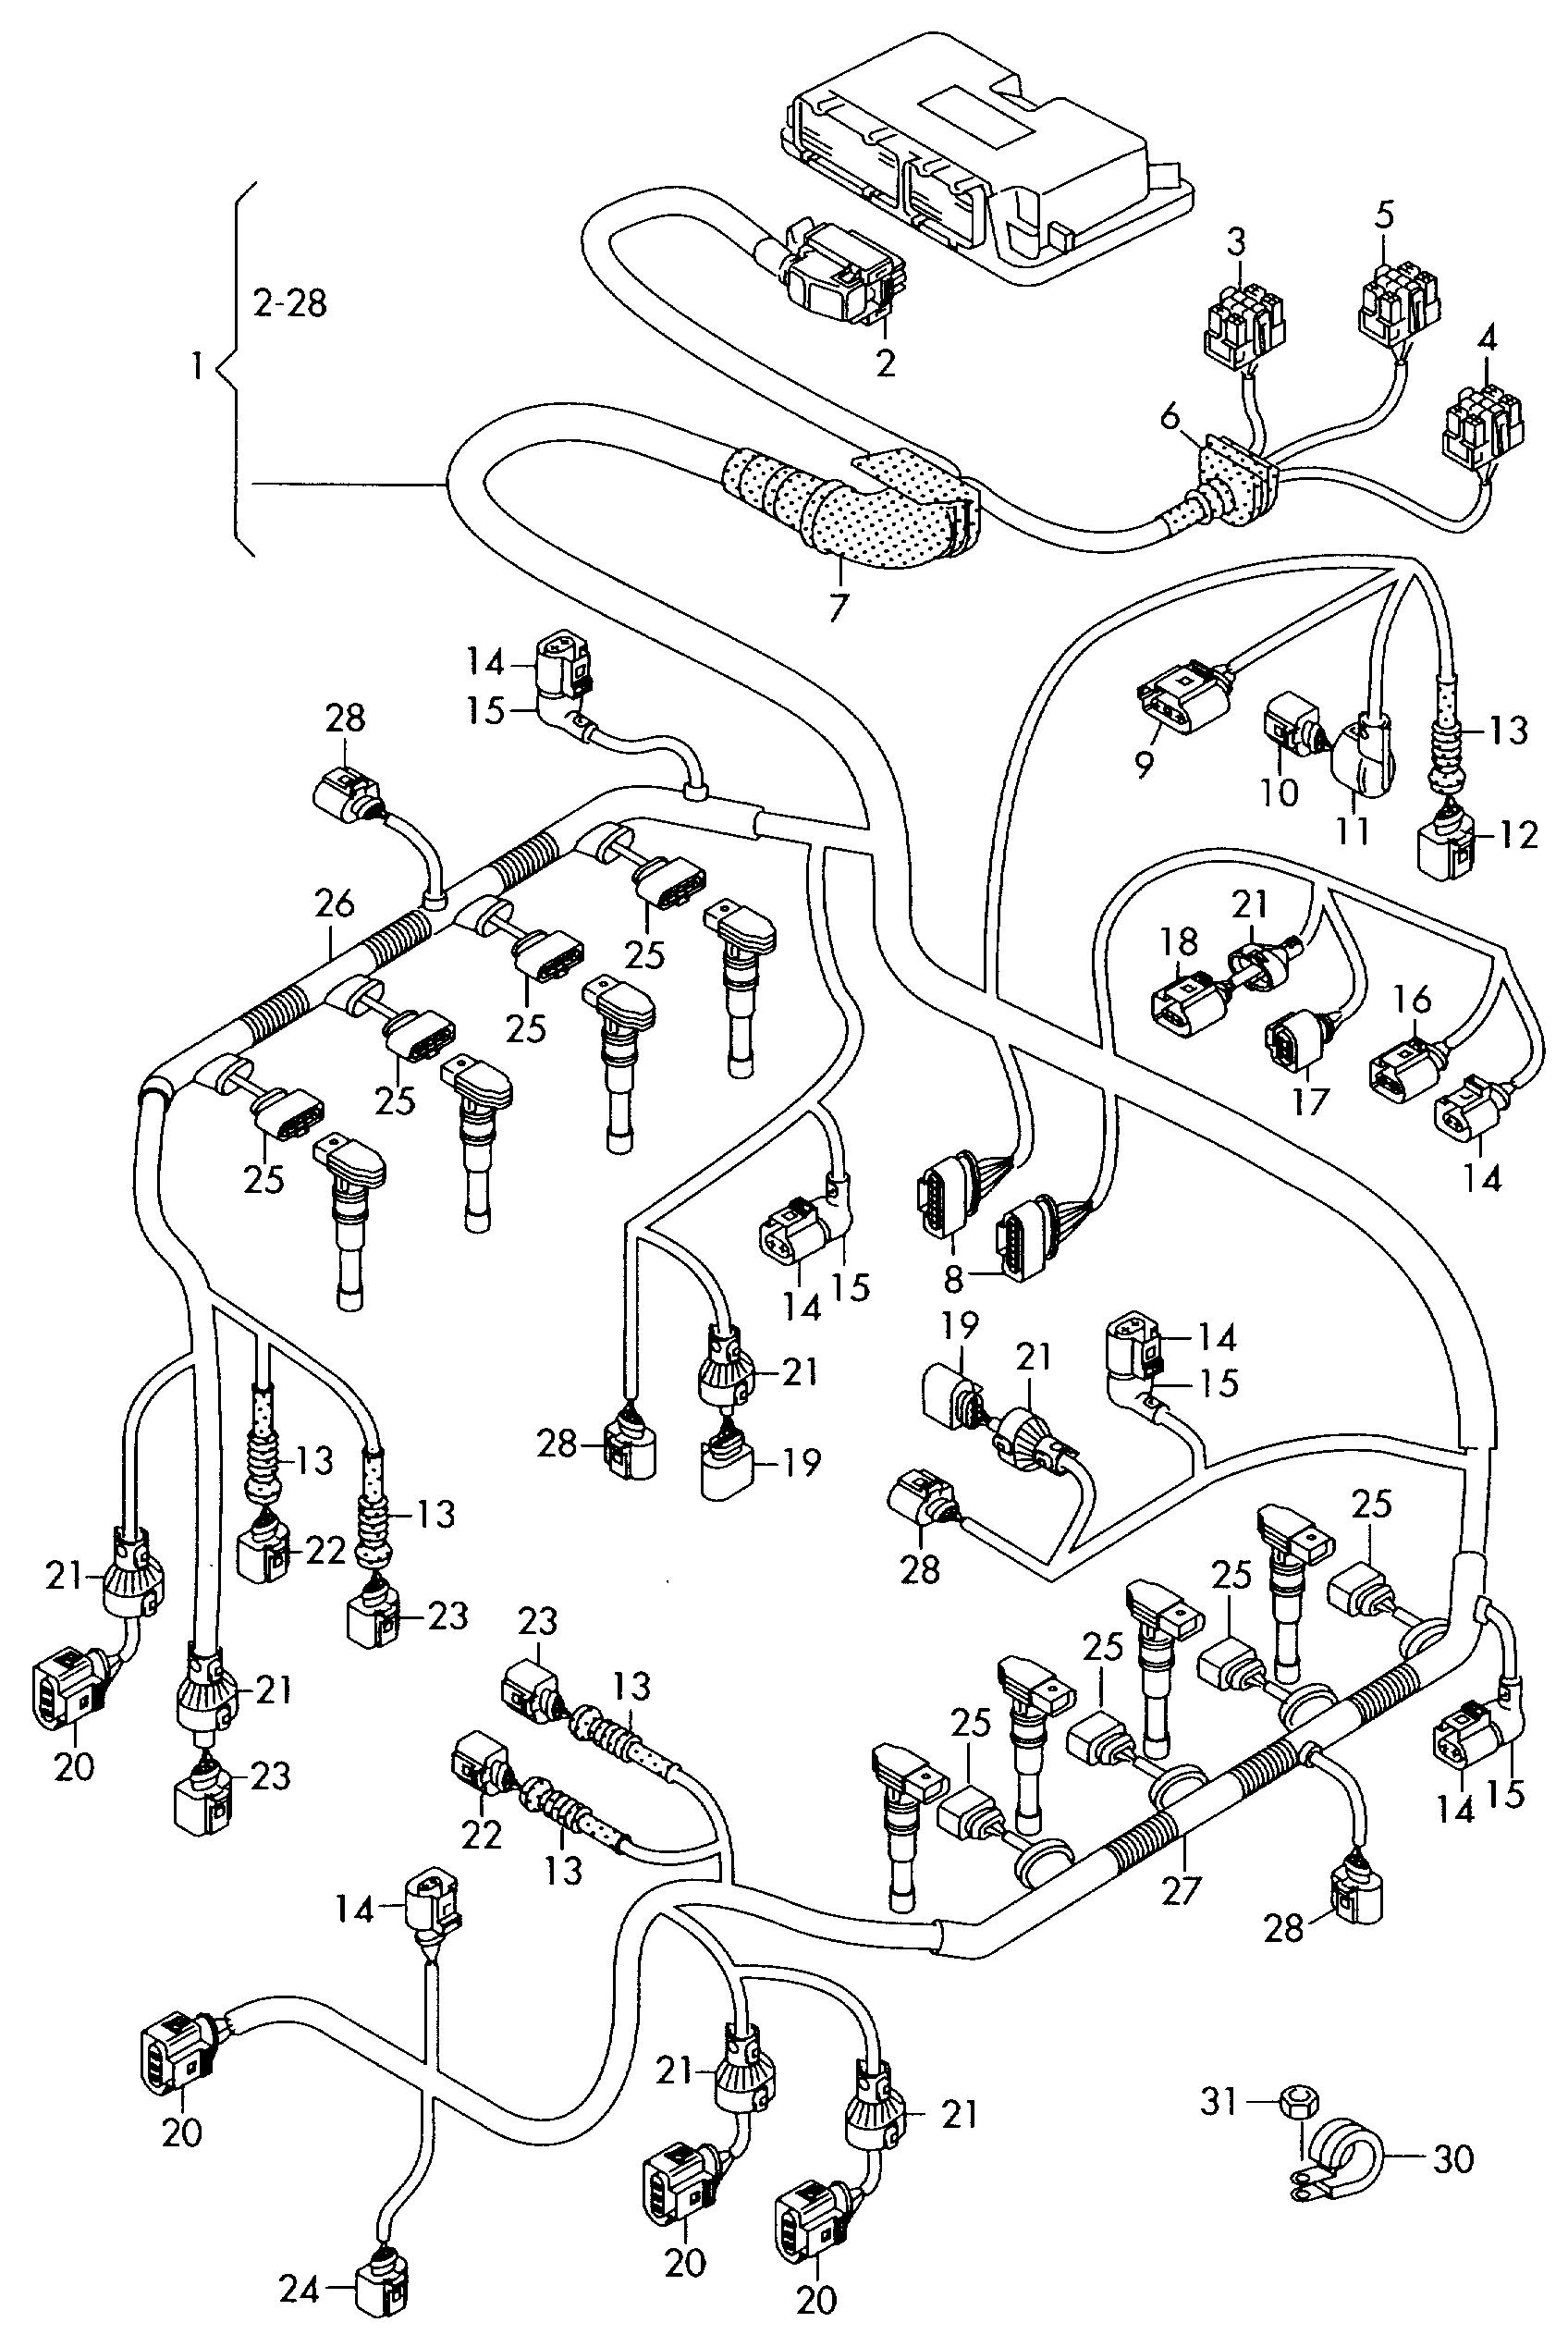 Diagram Audi Q7 2009 Wiring Diagram Full Version Hd Quality Wiring Diagram Procomwiring Efran It